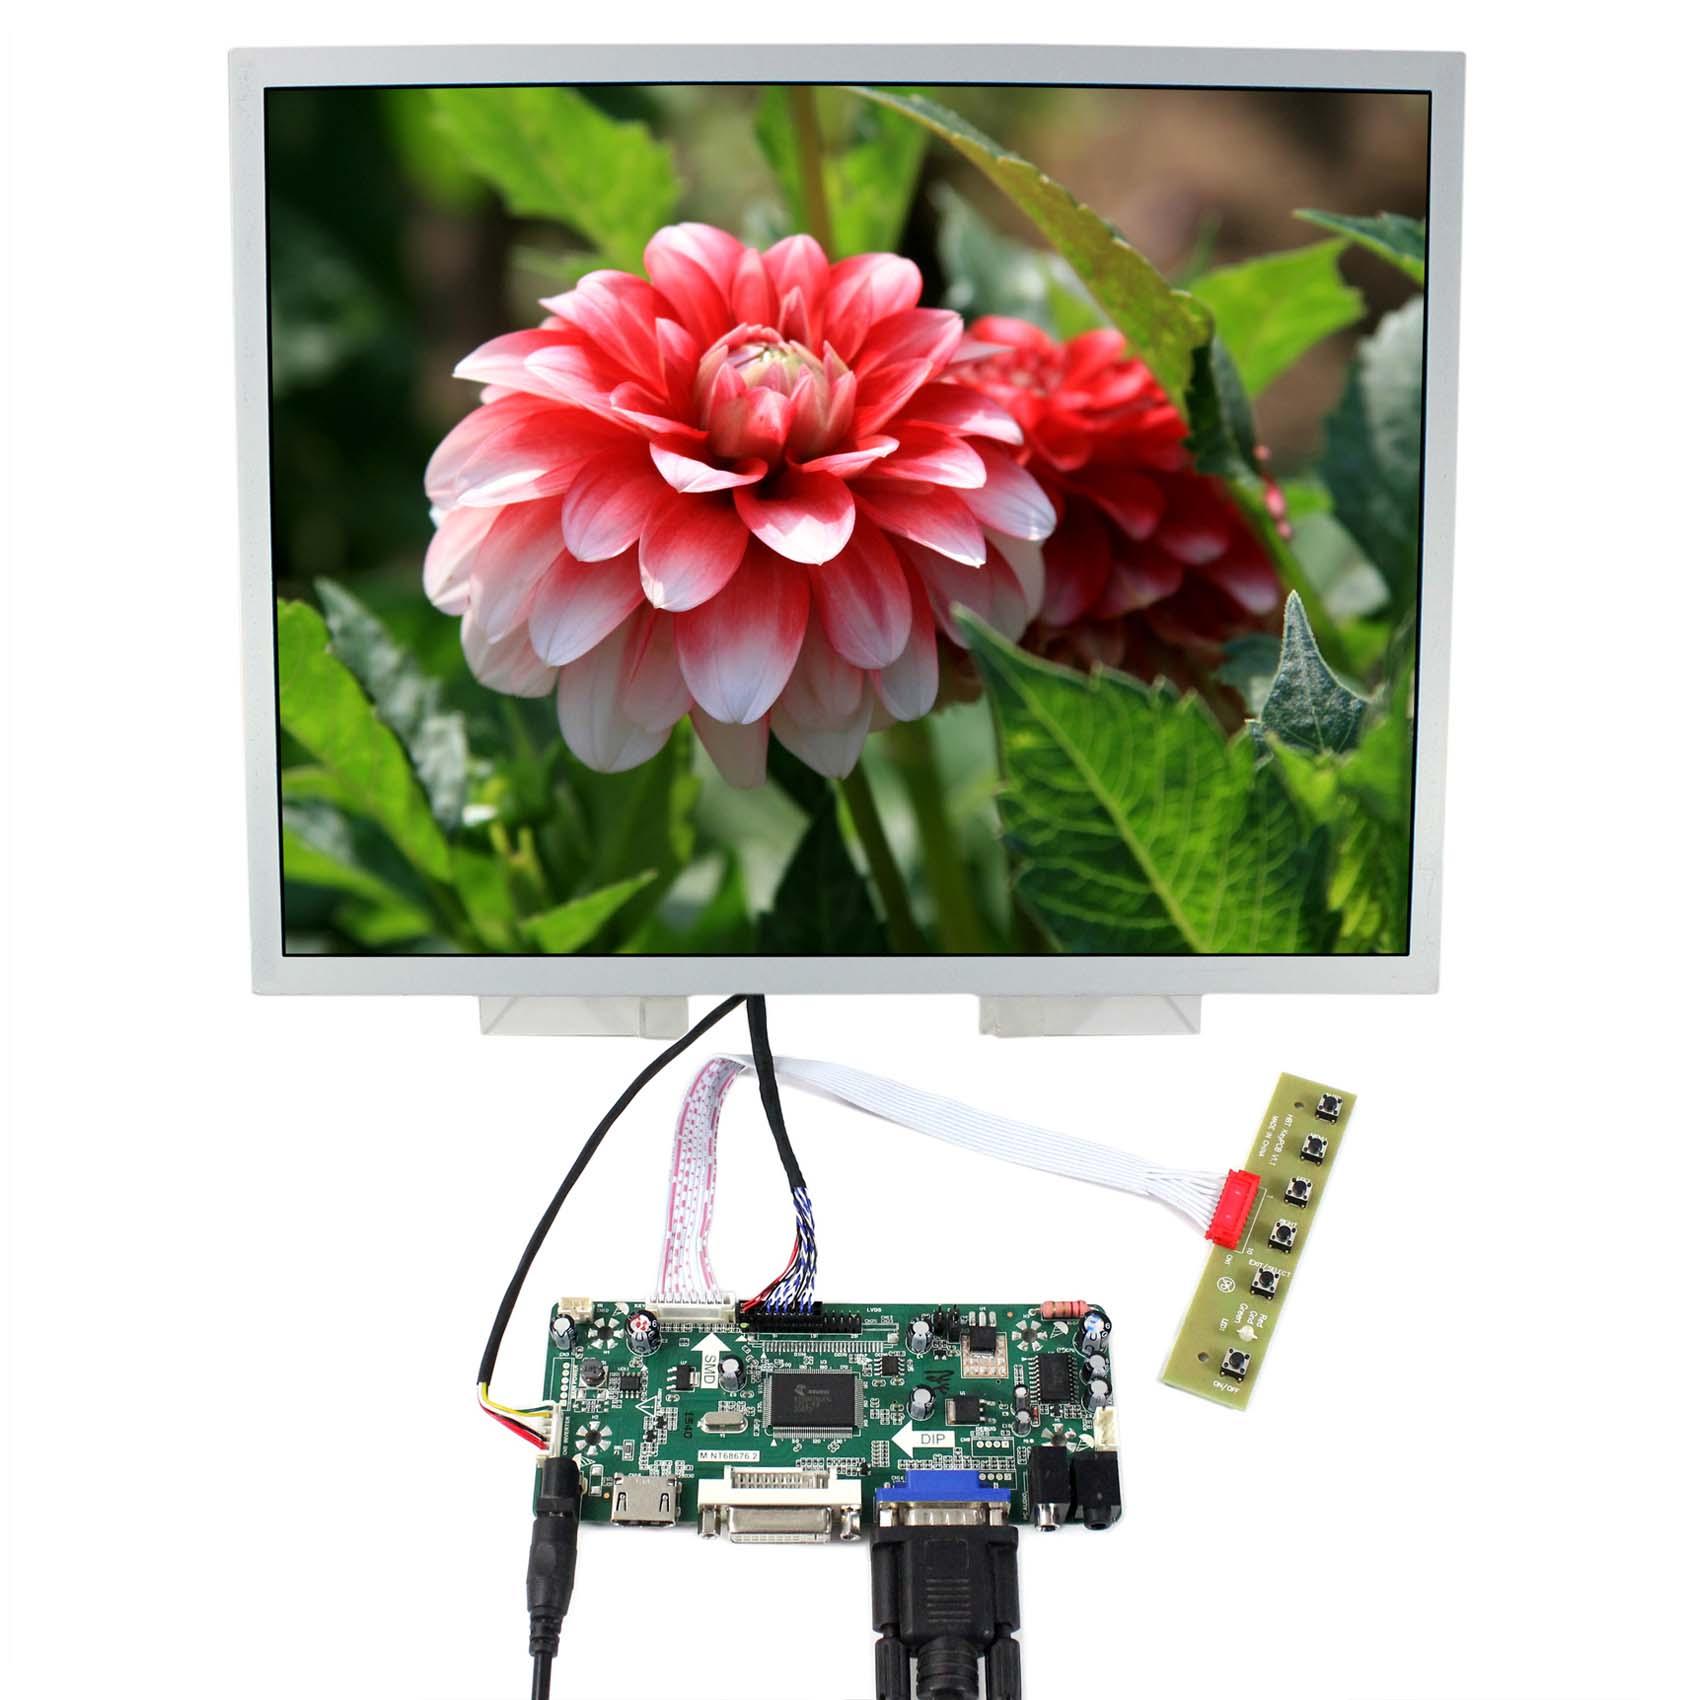 HDMI VGA DVI Audio LCD Controller Board M NT68676 With 15 LQ150X1LG96 1024x768 1050nit industrial LCD